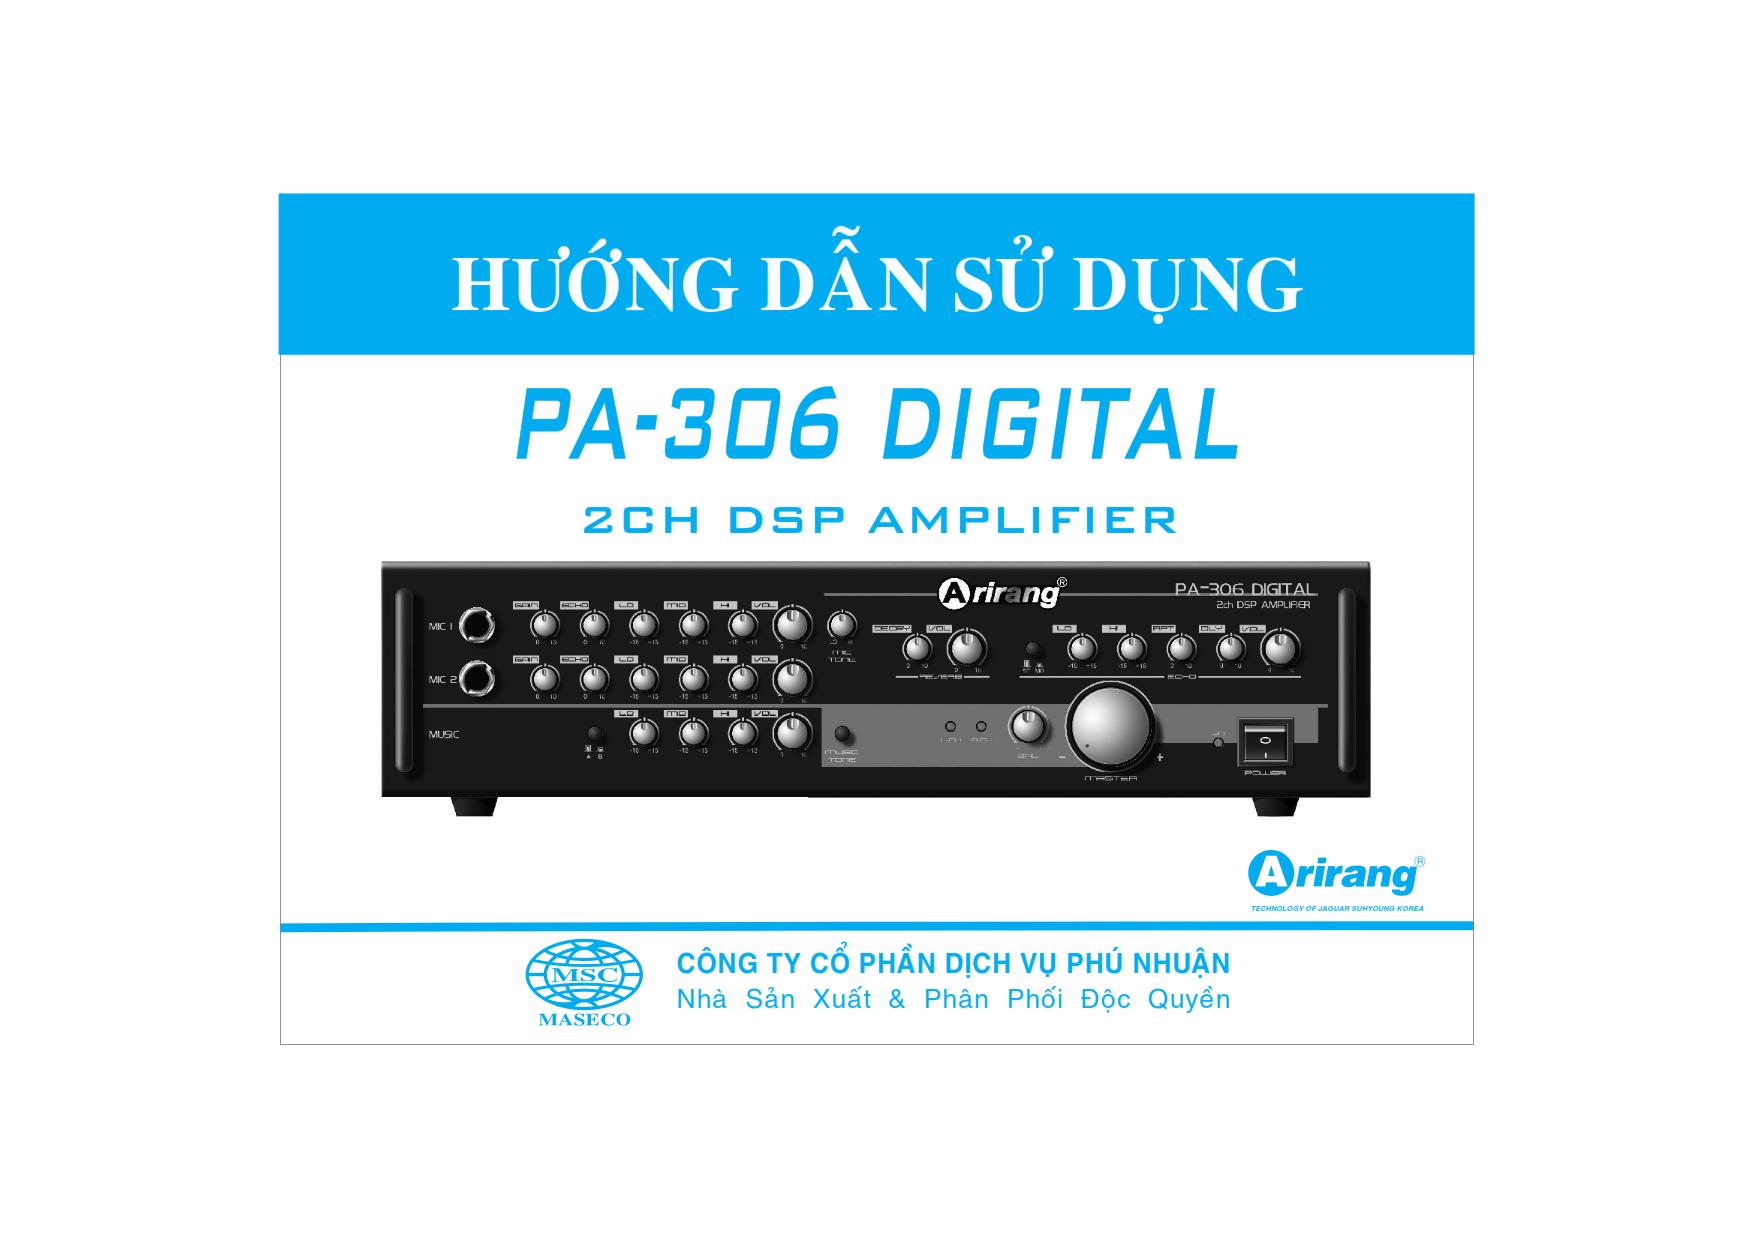 huong-dan-su-dung-amply-karaoke-arirang-HDSD-PA-306-DIGITAL_001.png